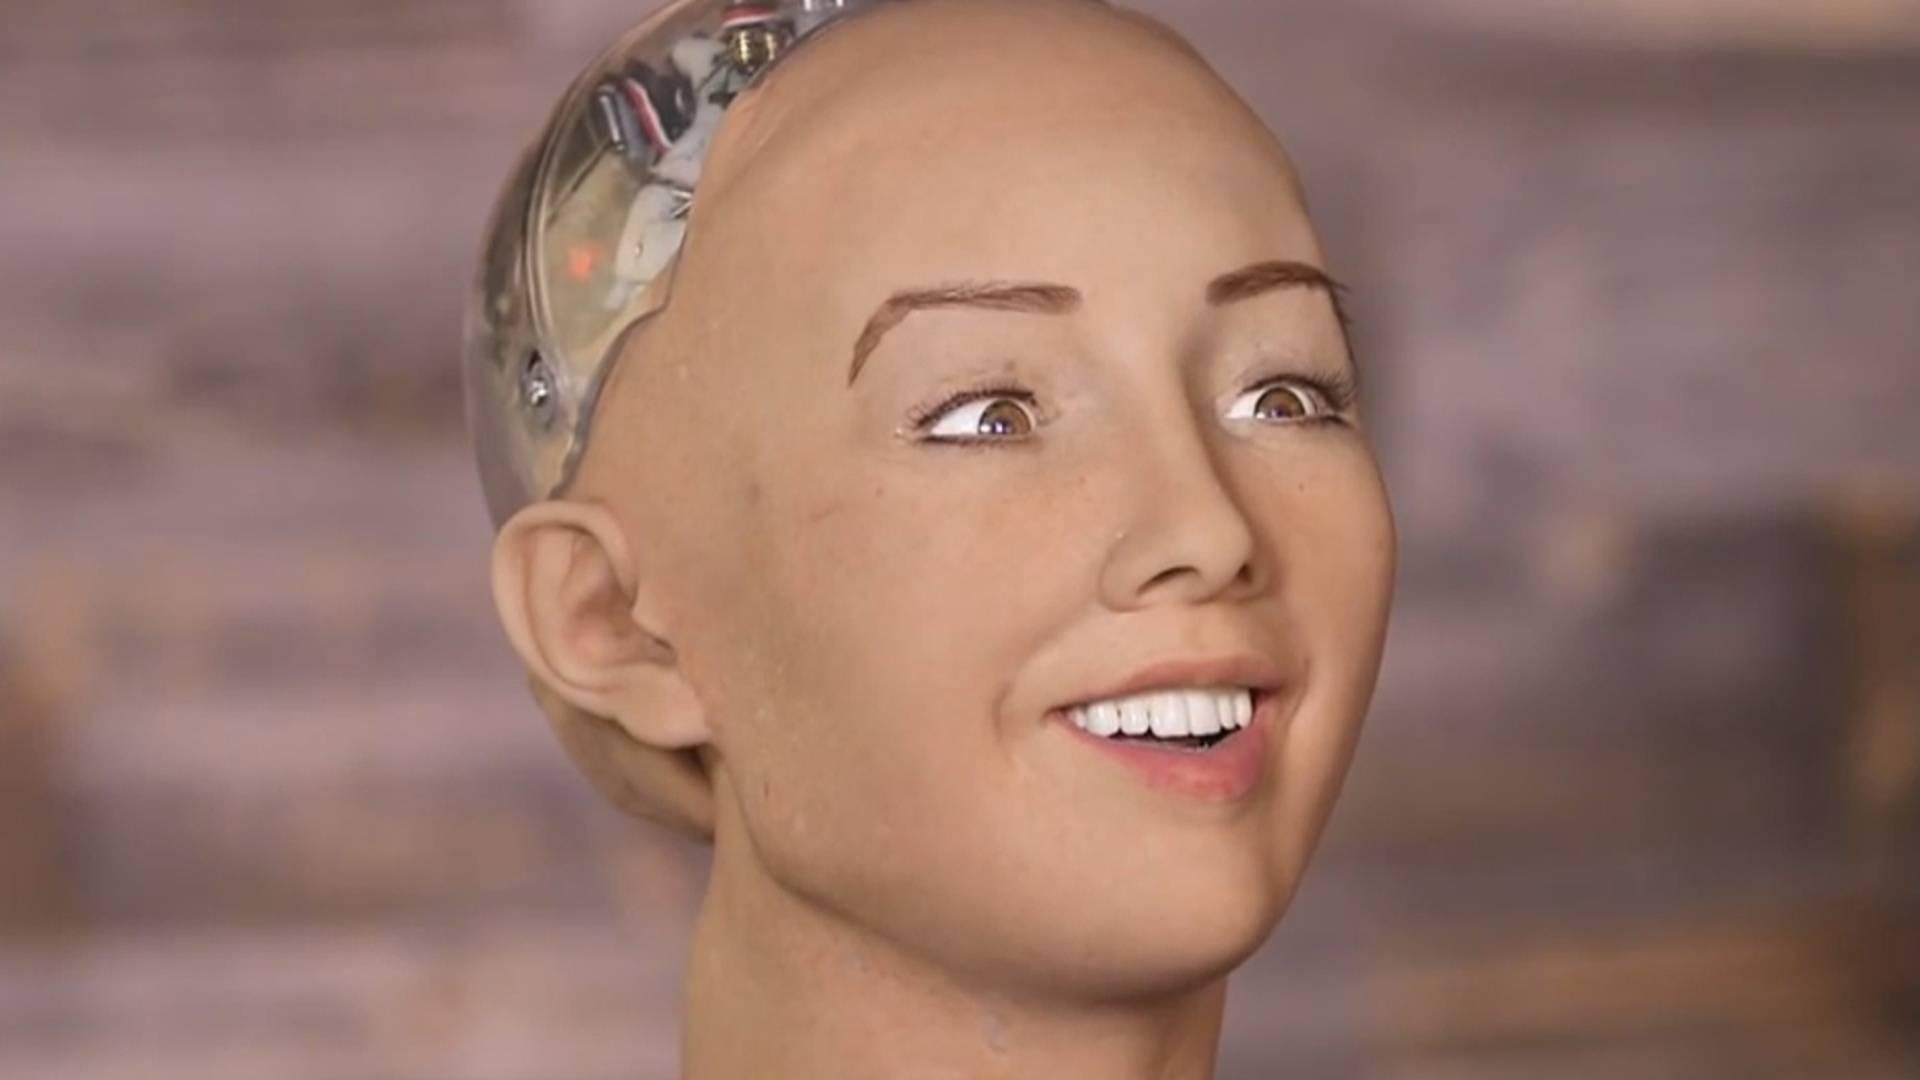 Elon Musk Hit Back After a Robot Threw Shade at Him Over AI Warnings